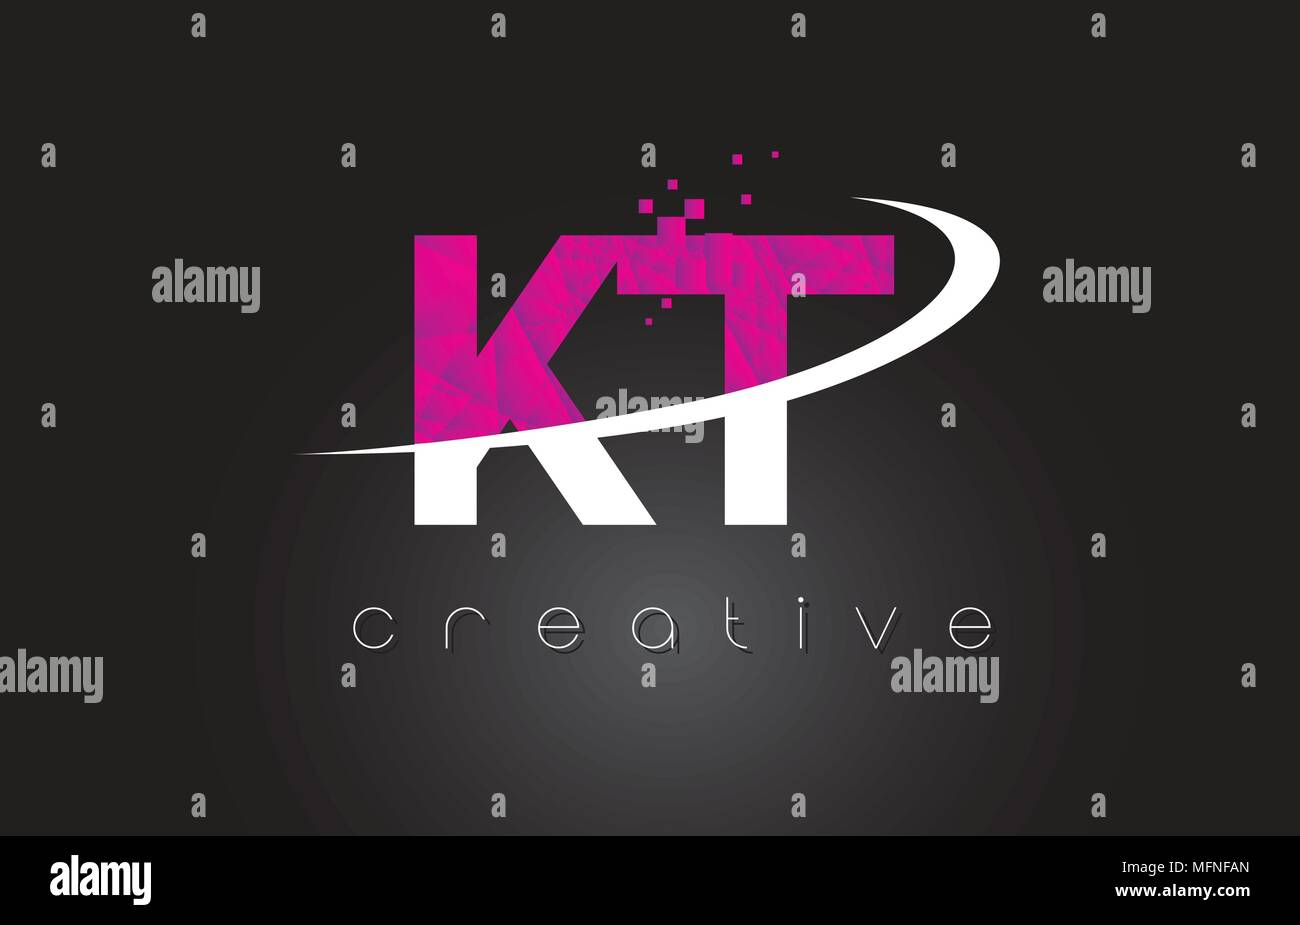 Kt K T Creative Letters Design White Pink Letter Vector